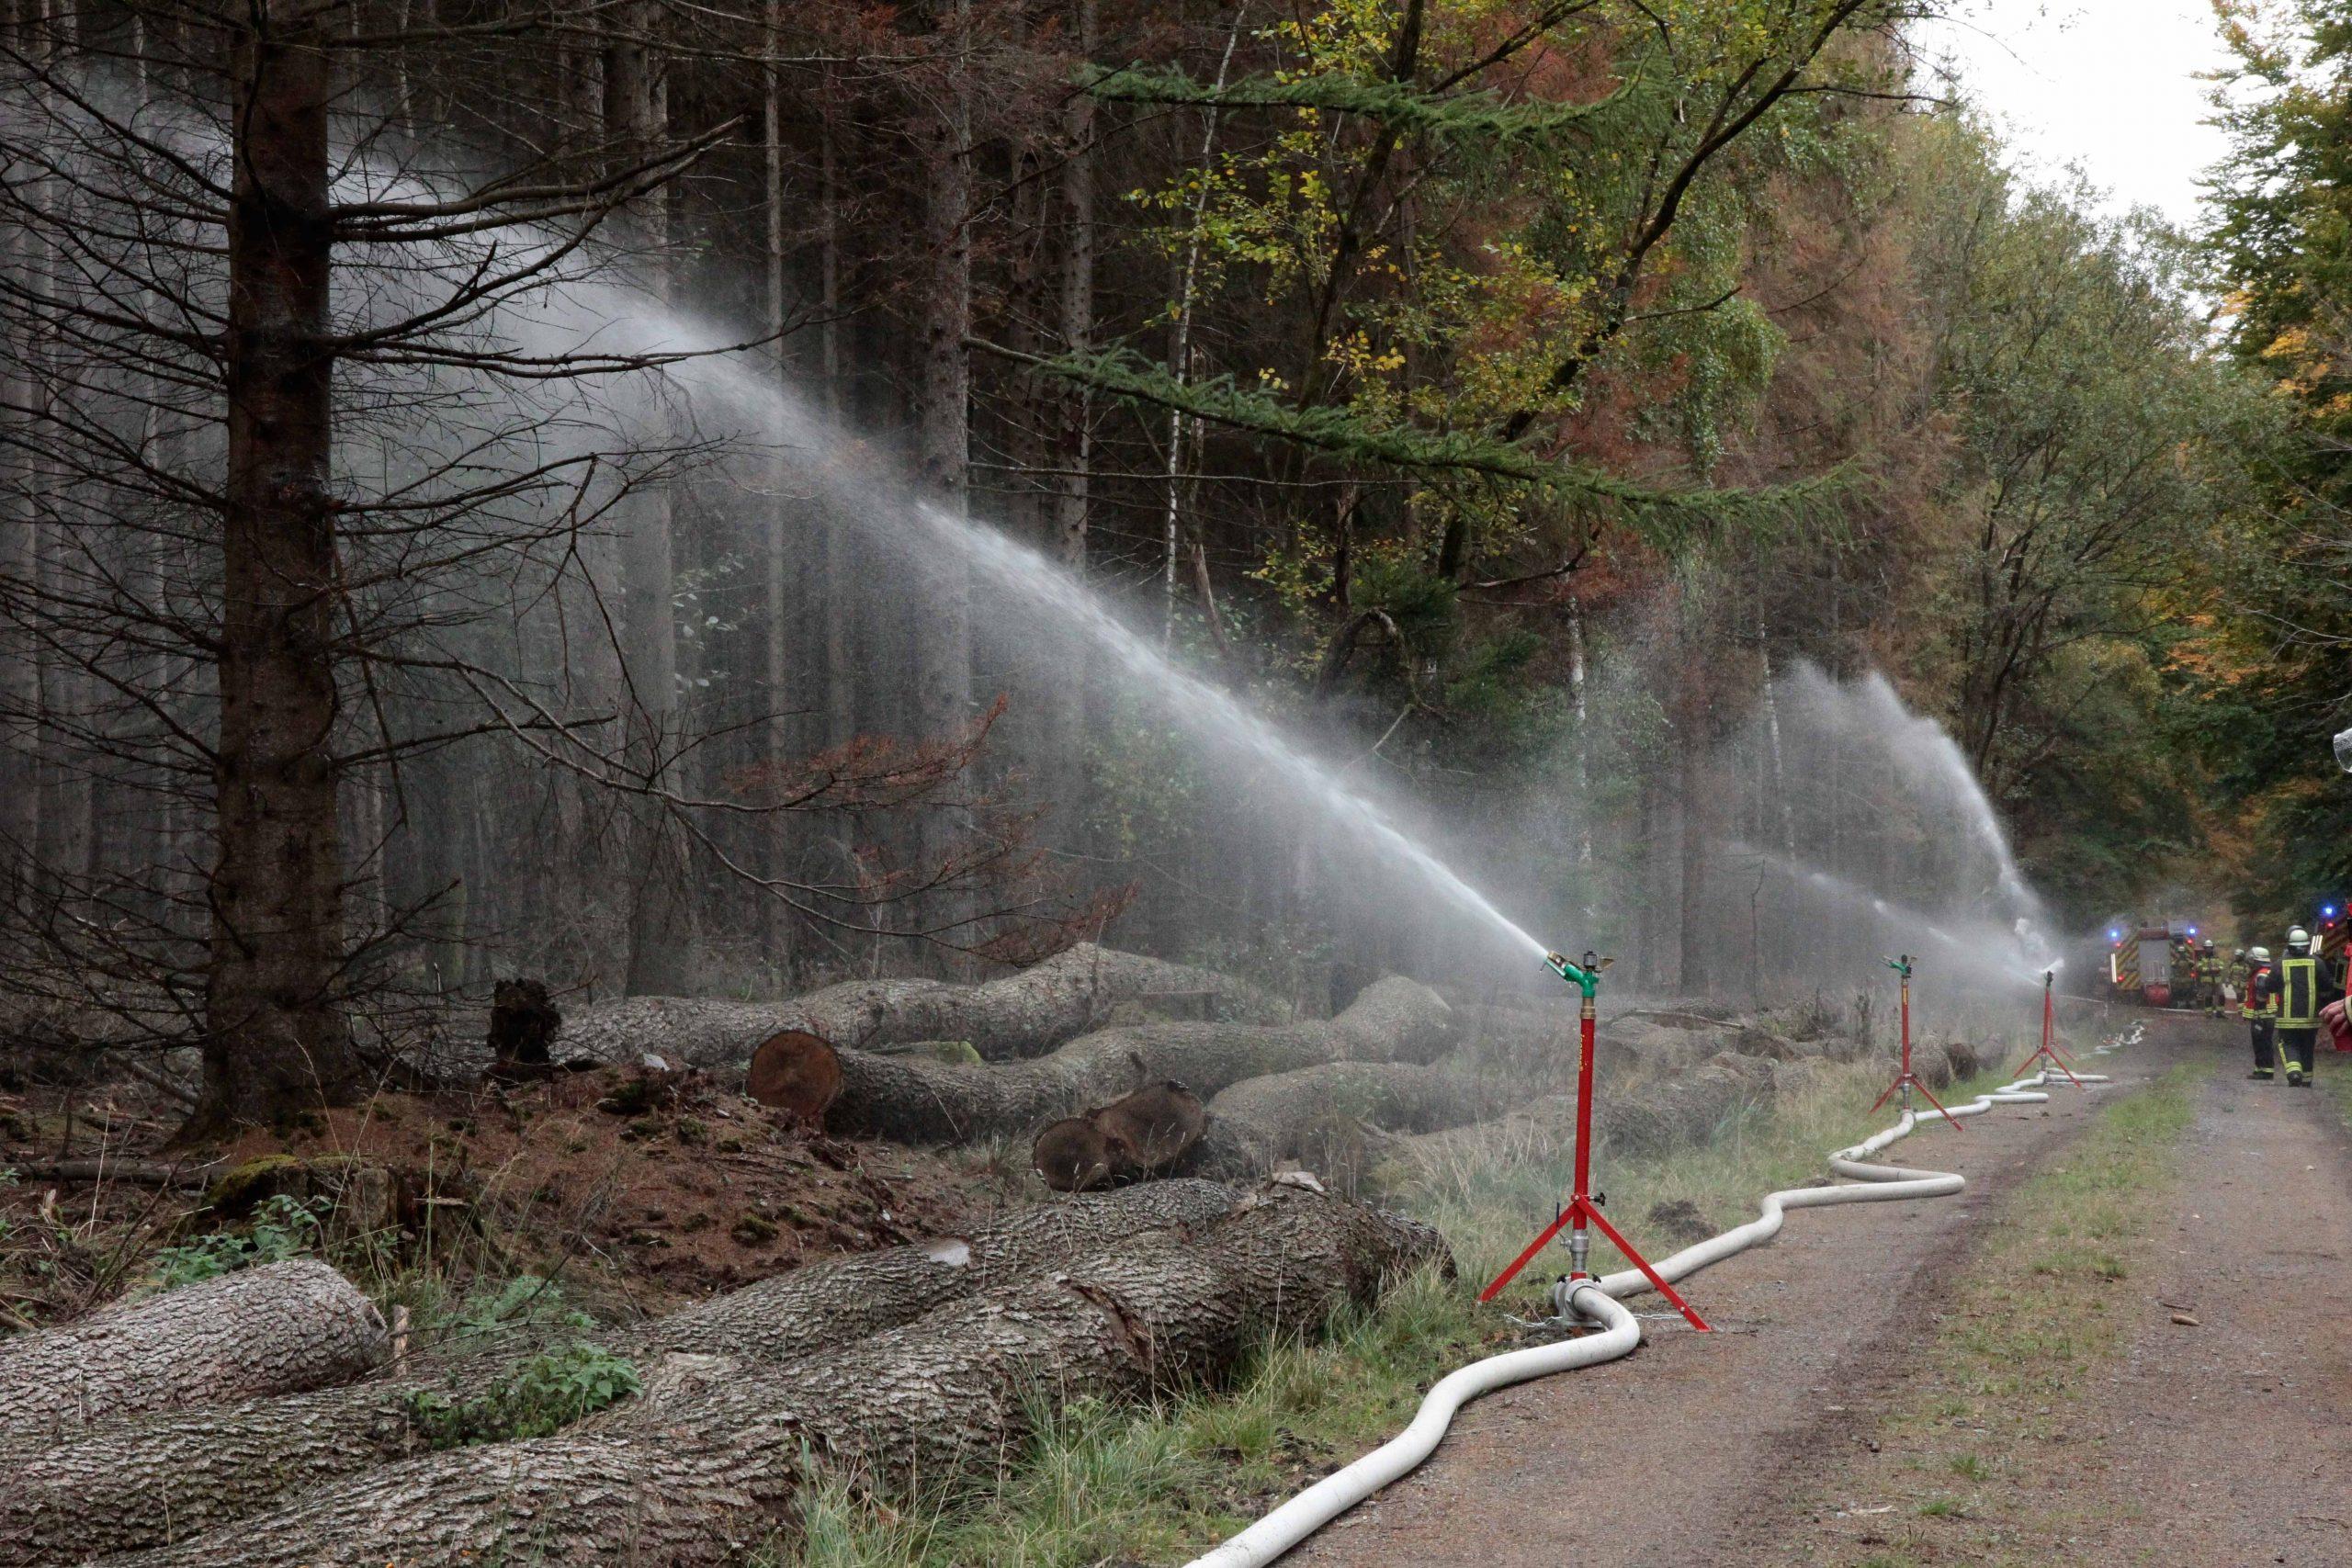 kreisregner-zur vegetationsbrandbekämpfung